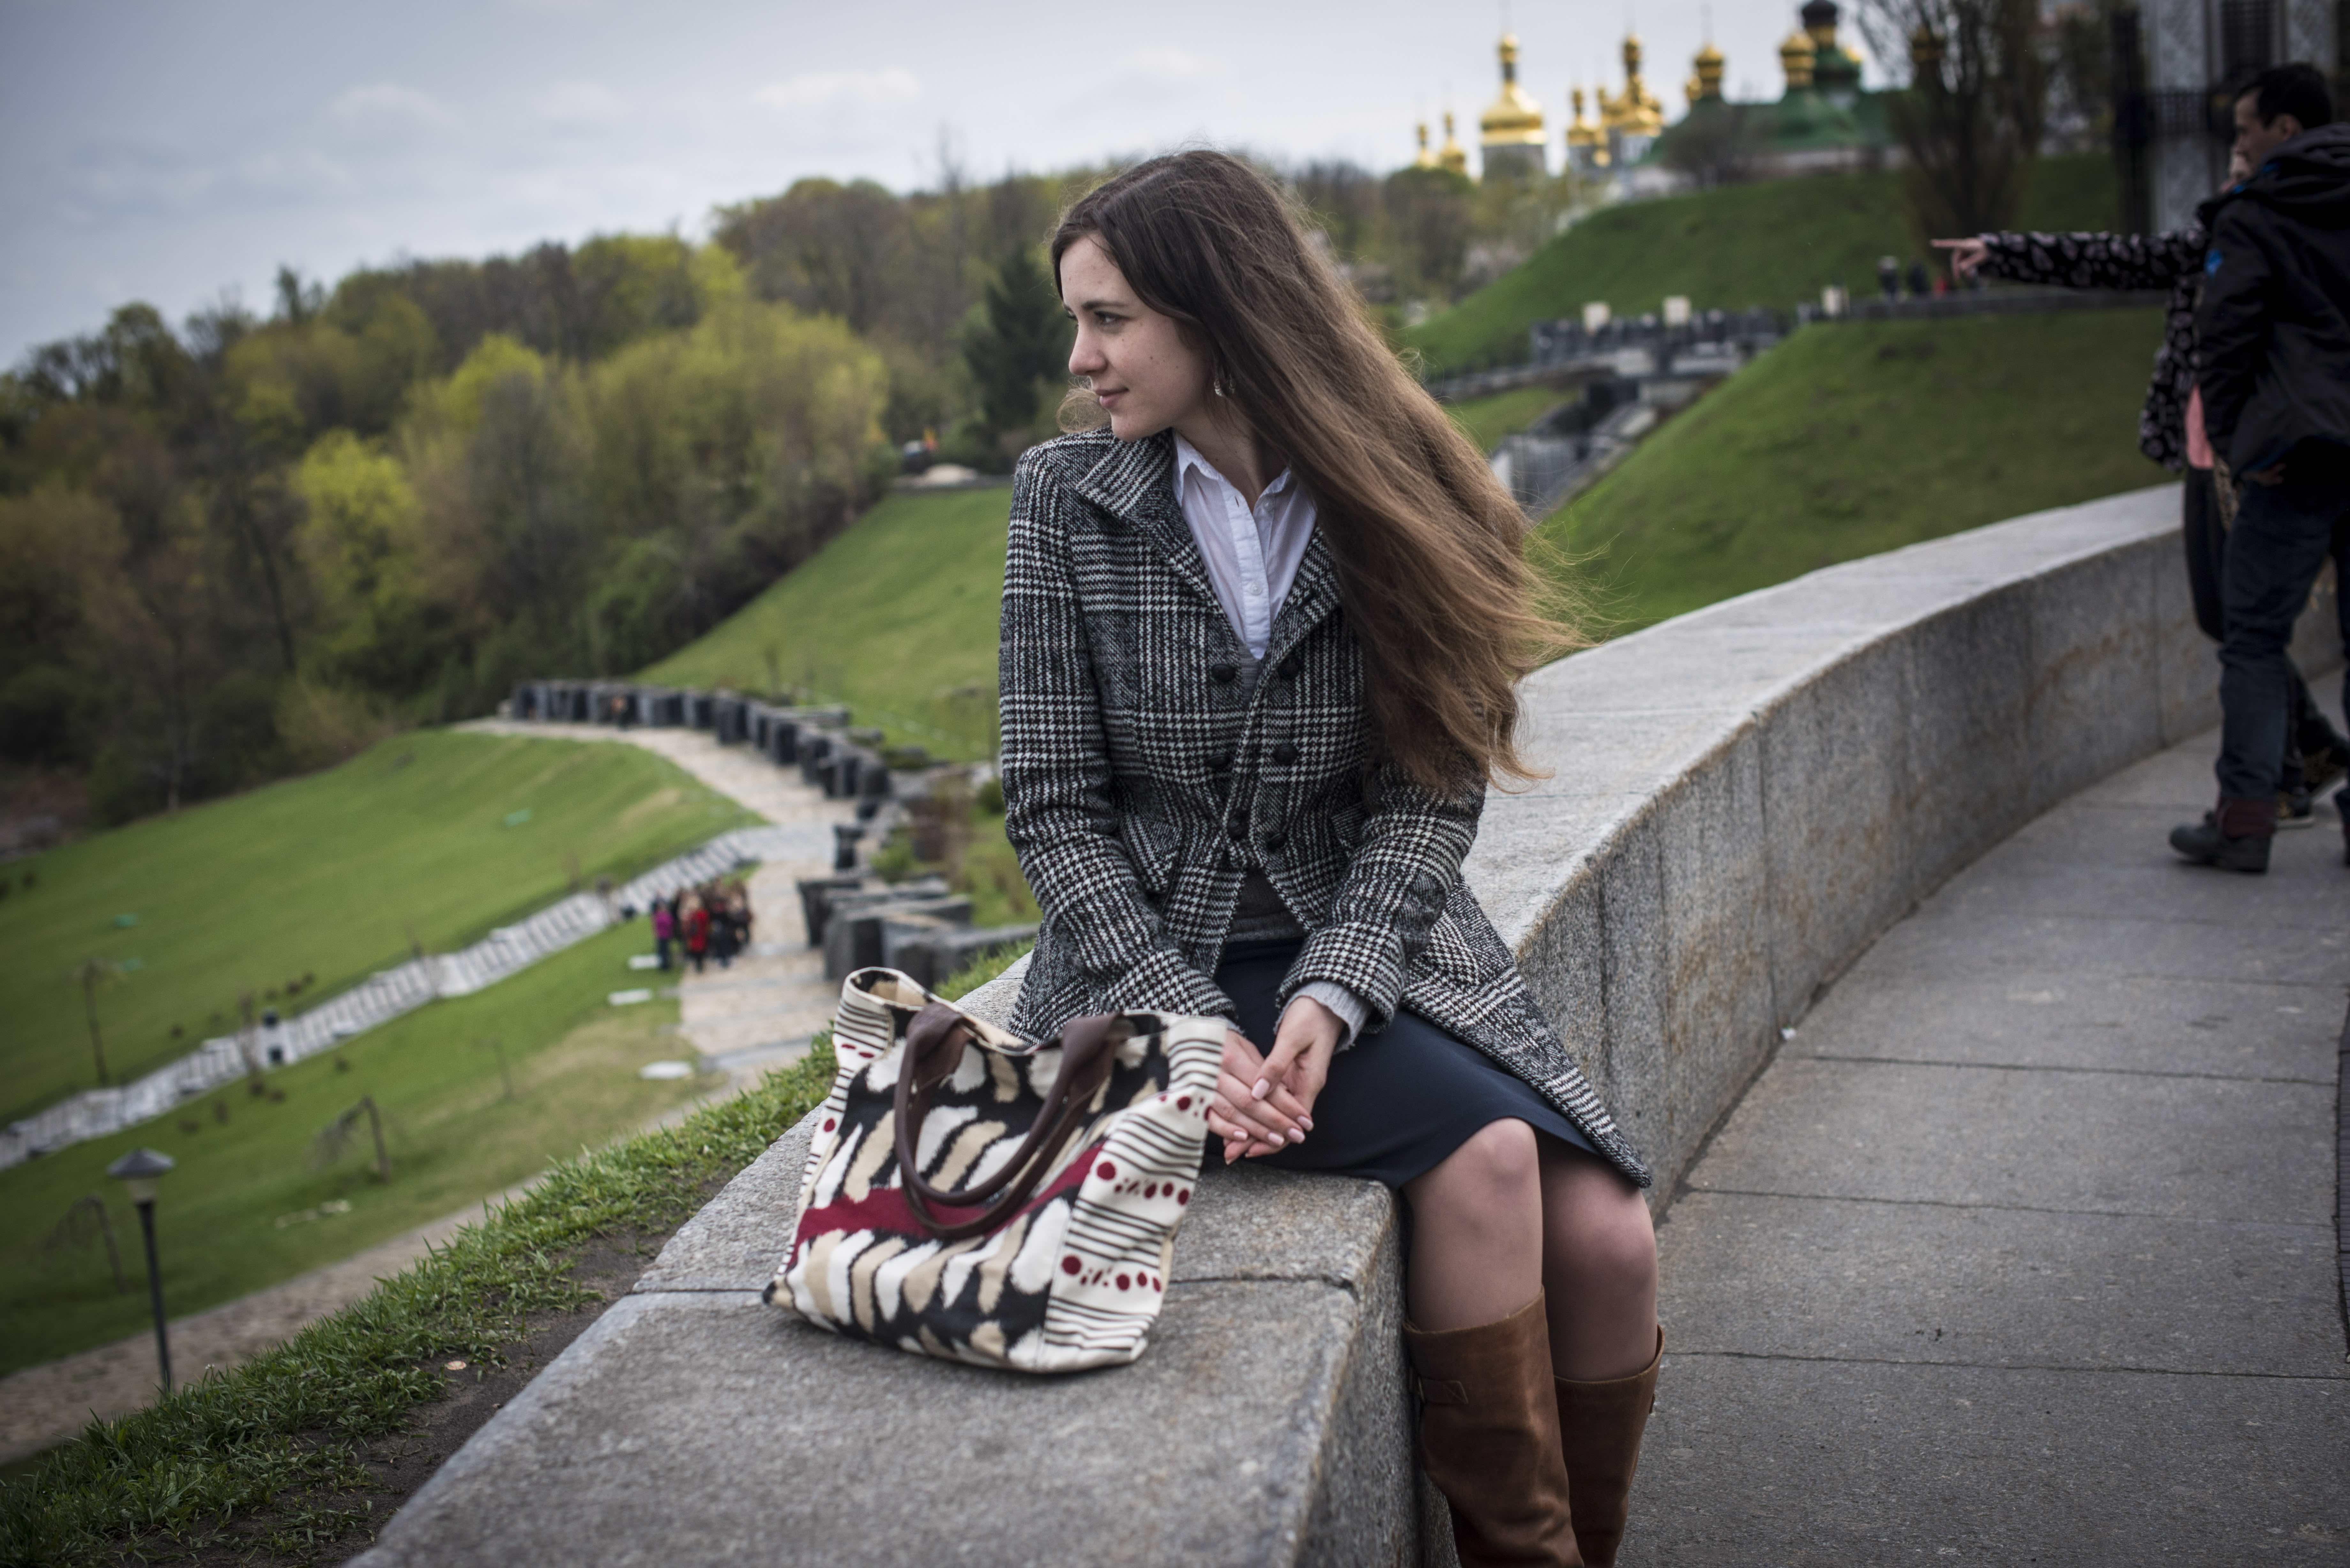 Youth in Kiev